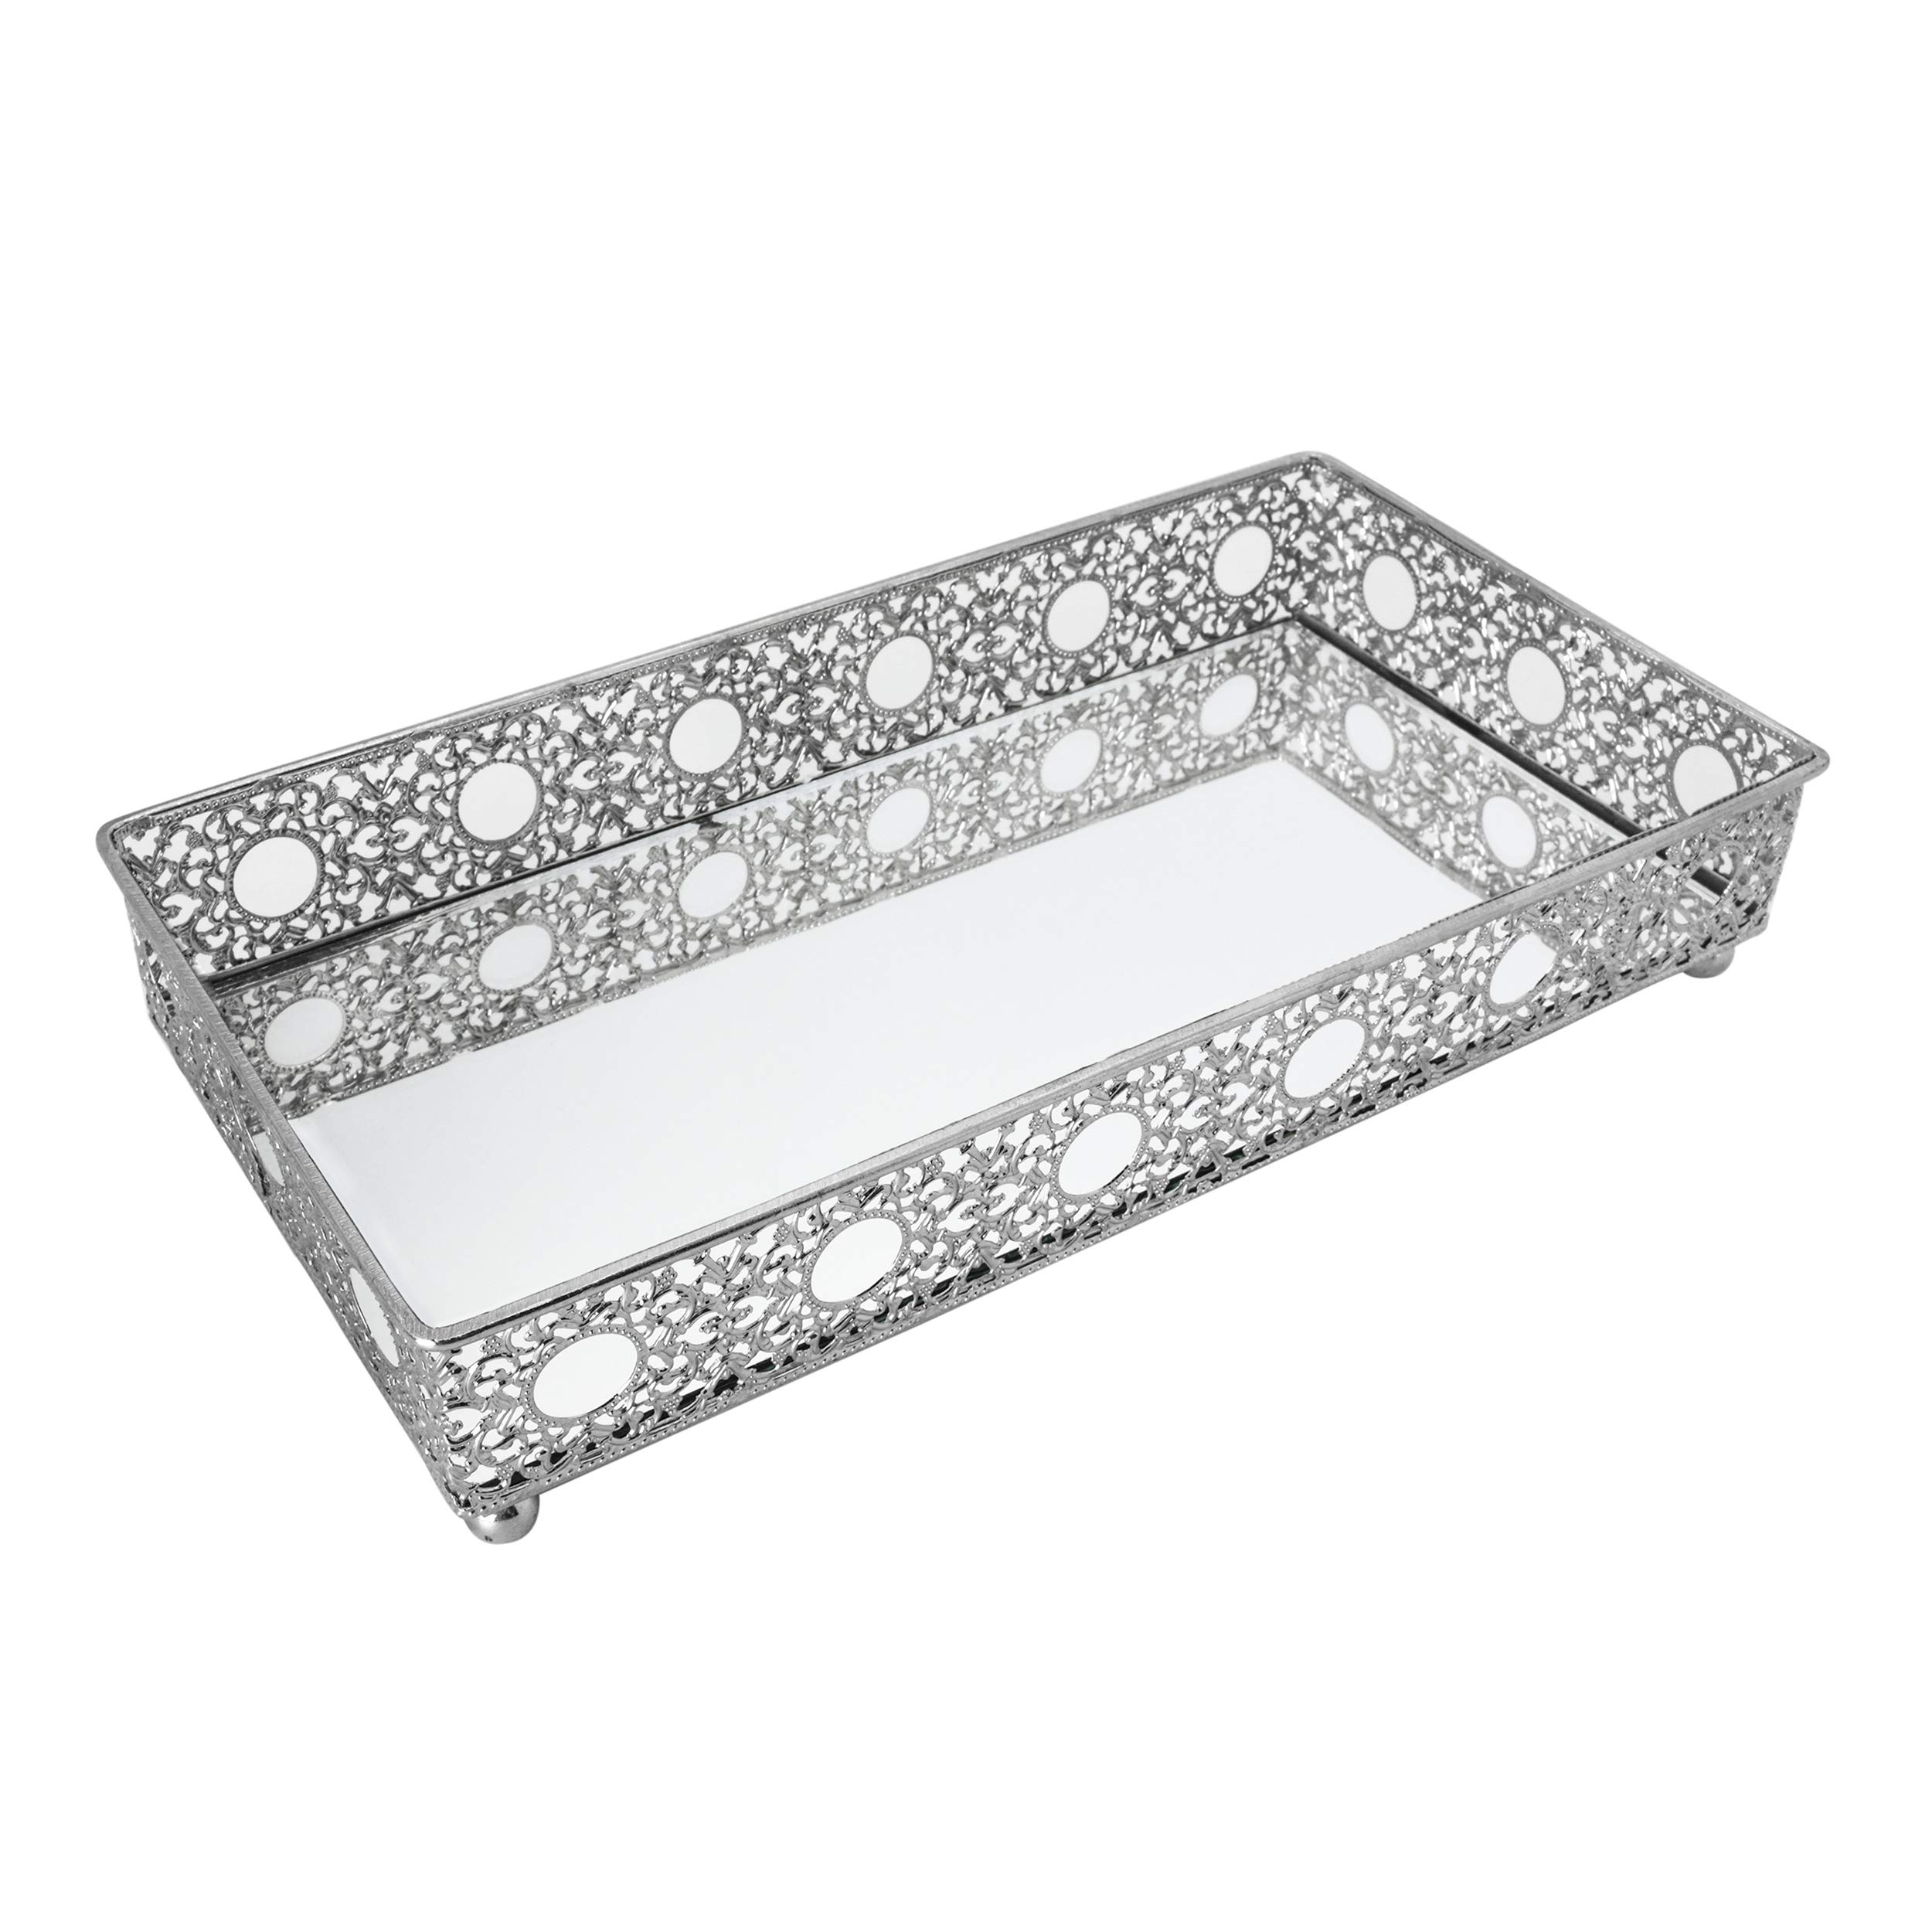 Bathroom Vanity Tray, Decorative Tray, Mirror Tray. Perfume Collection Tray by O-Plus